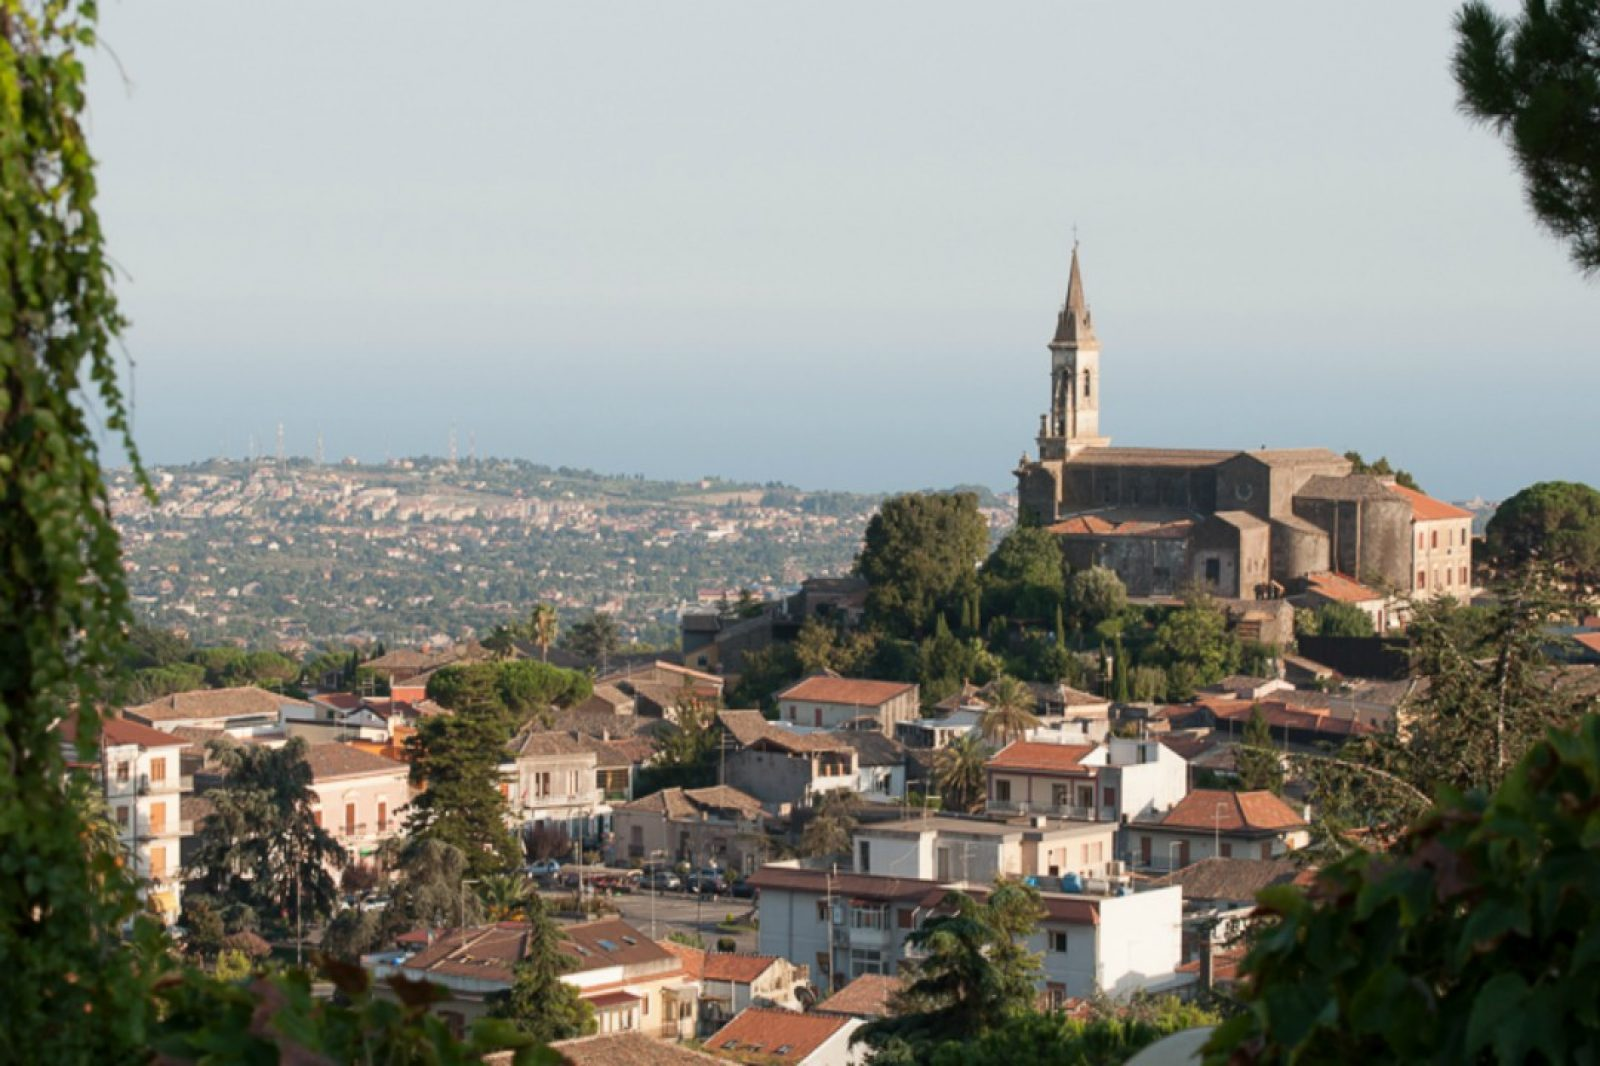 Paesi dell'Etna: Trecastagni tra chiese e cantine